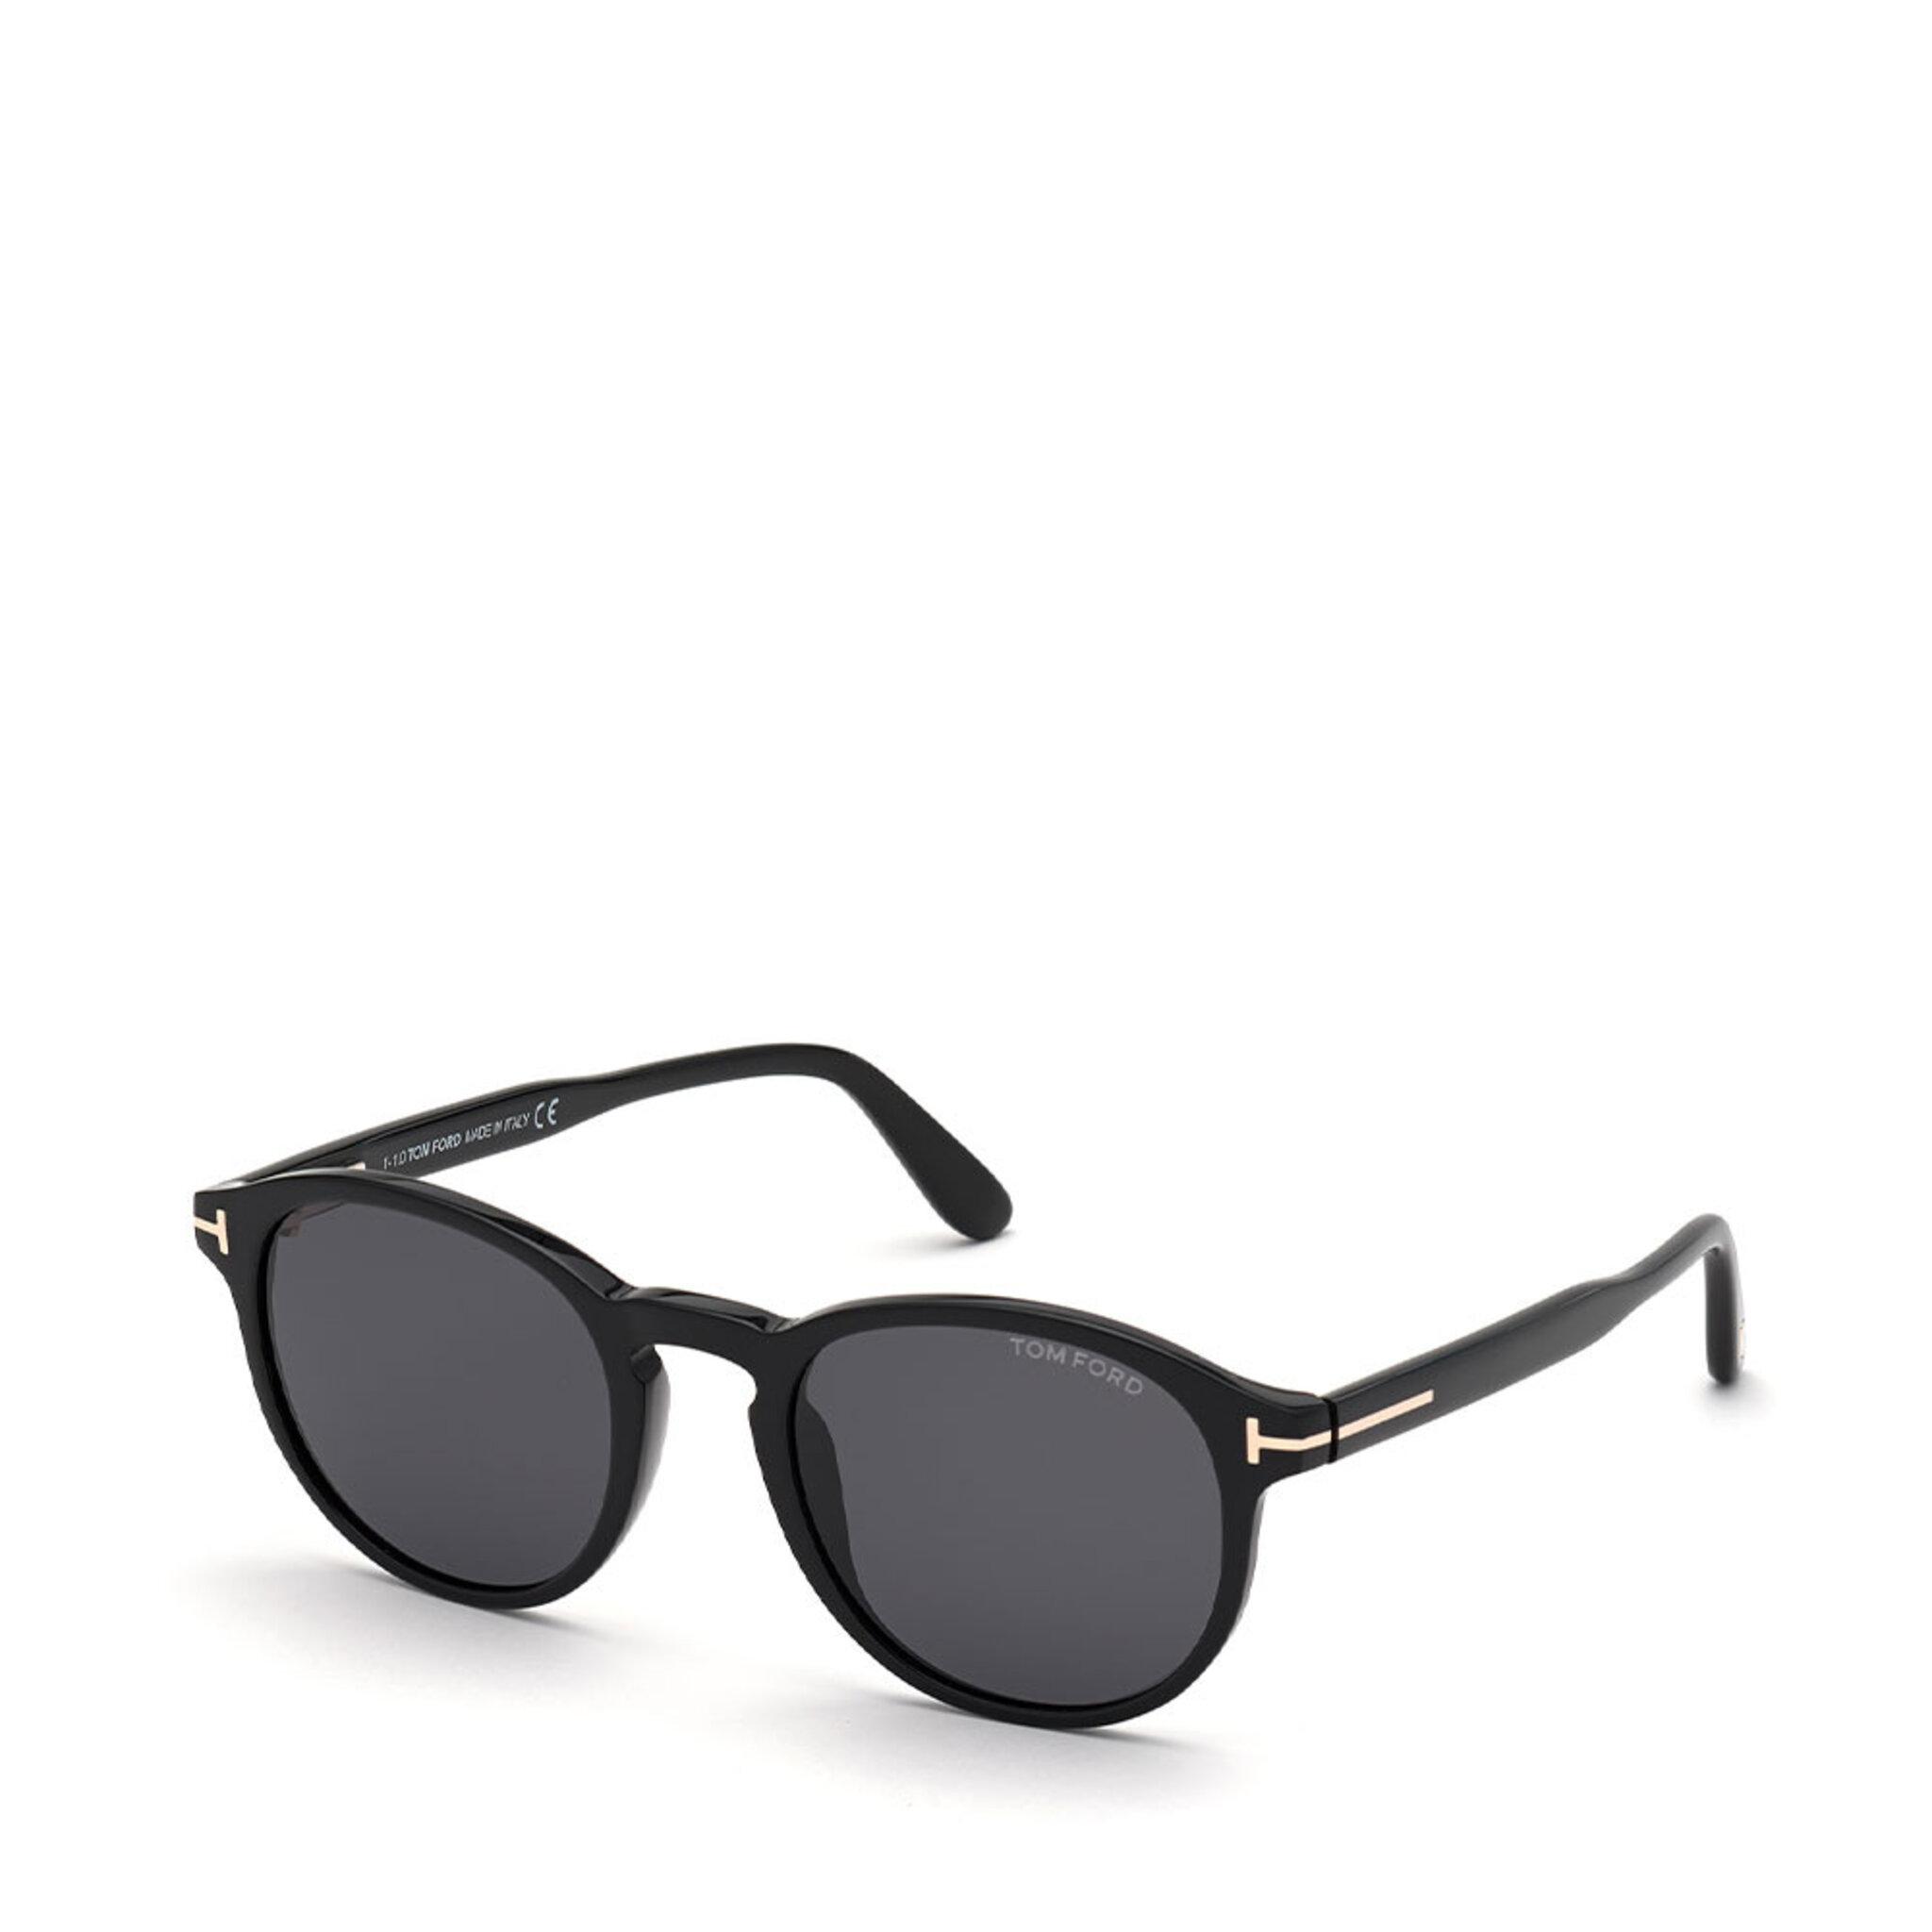 Sunglasses FT0834 Dante